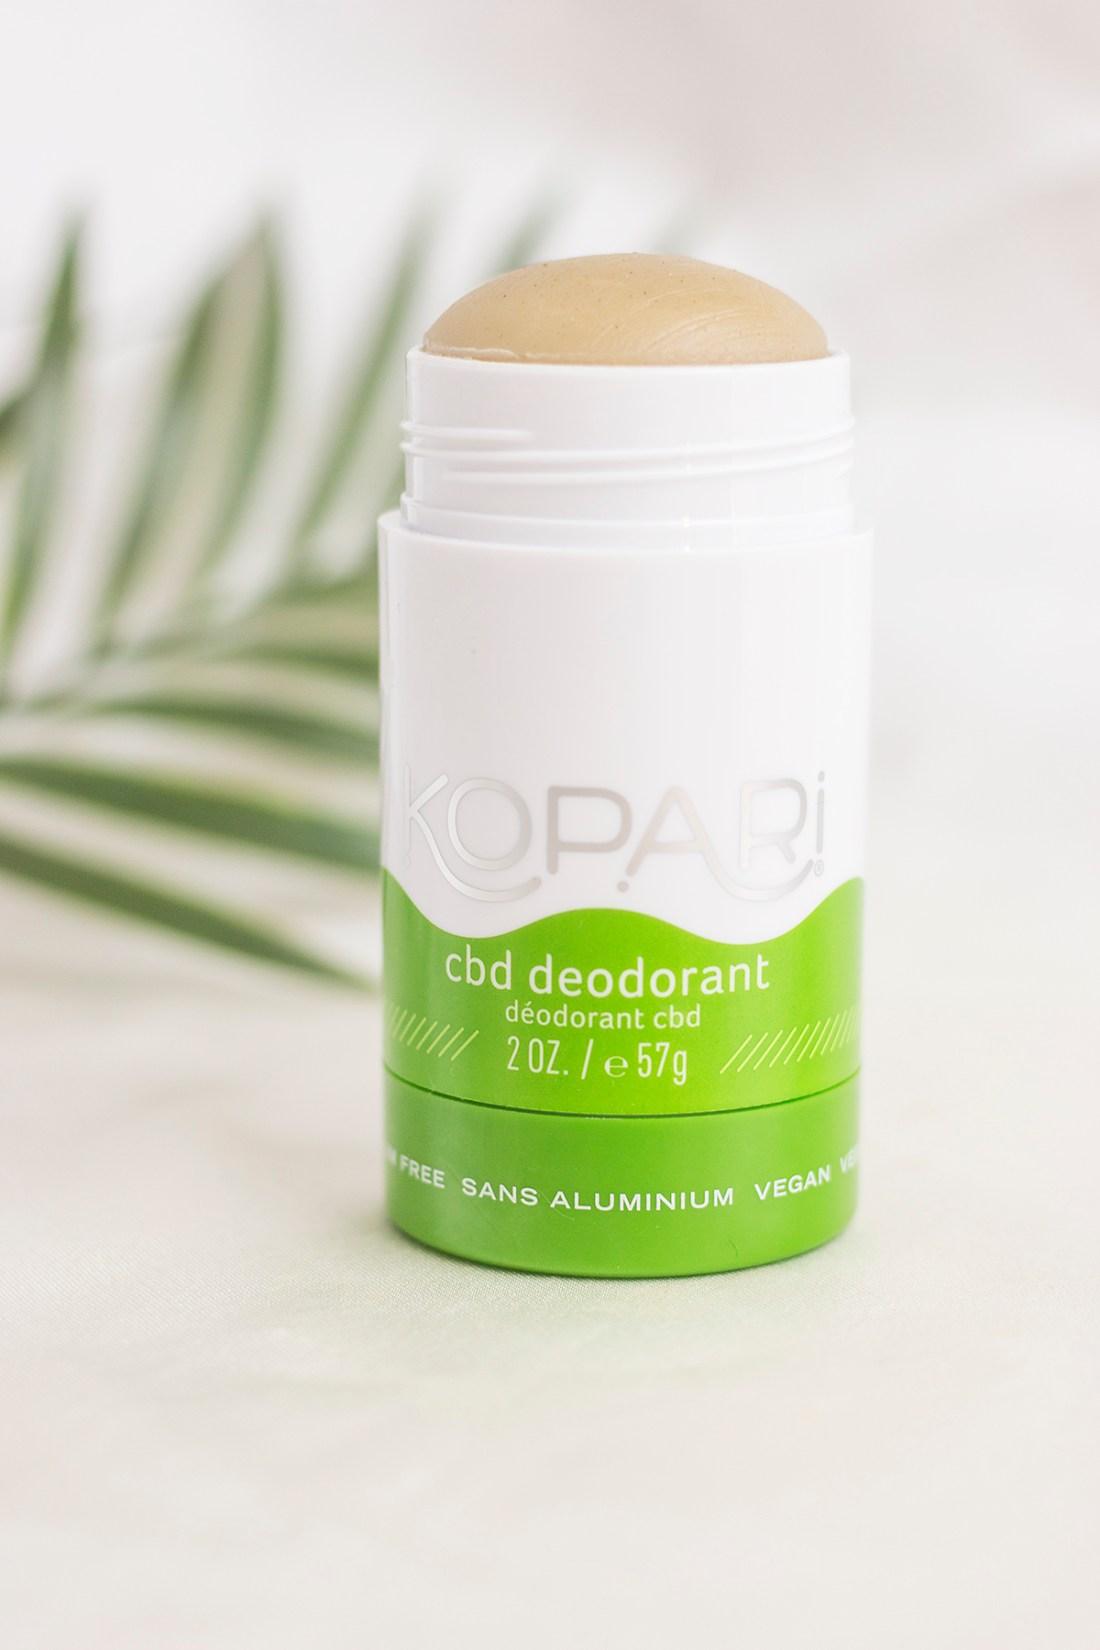 Kopari CBD Deodorant | A Good Hue